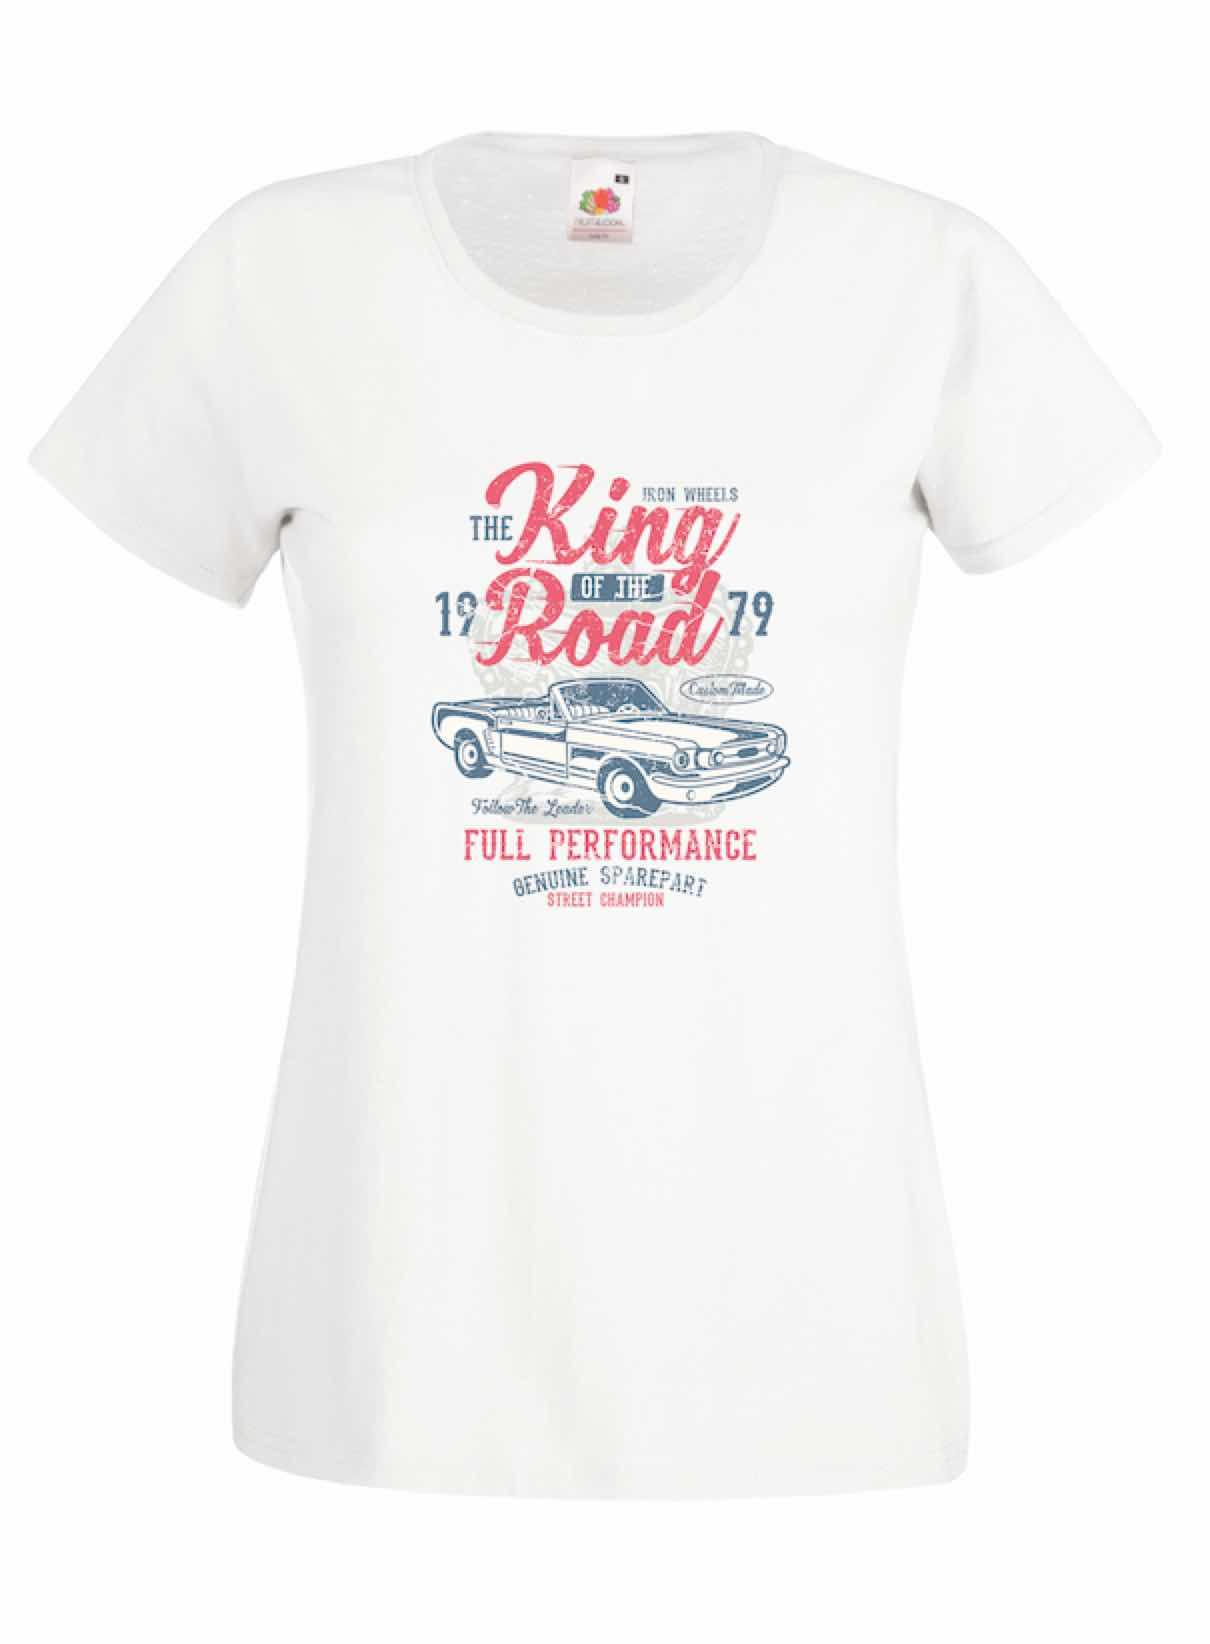 King Of The Road design for t-shirt, hoodie & sweatshirt